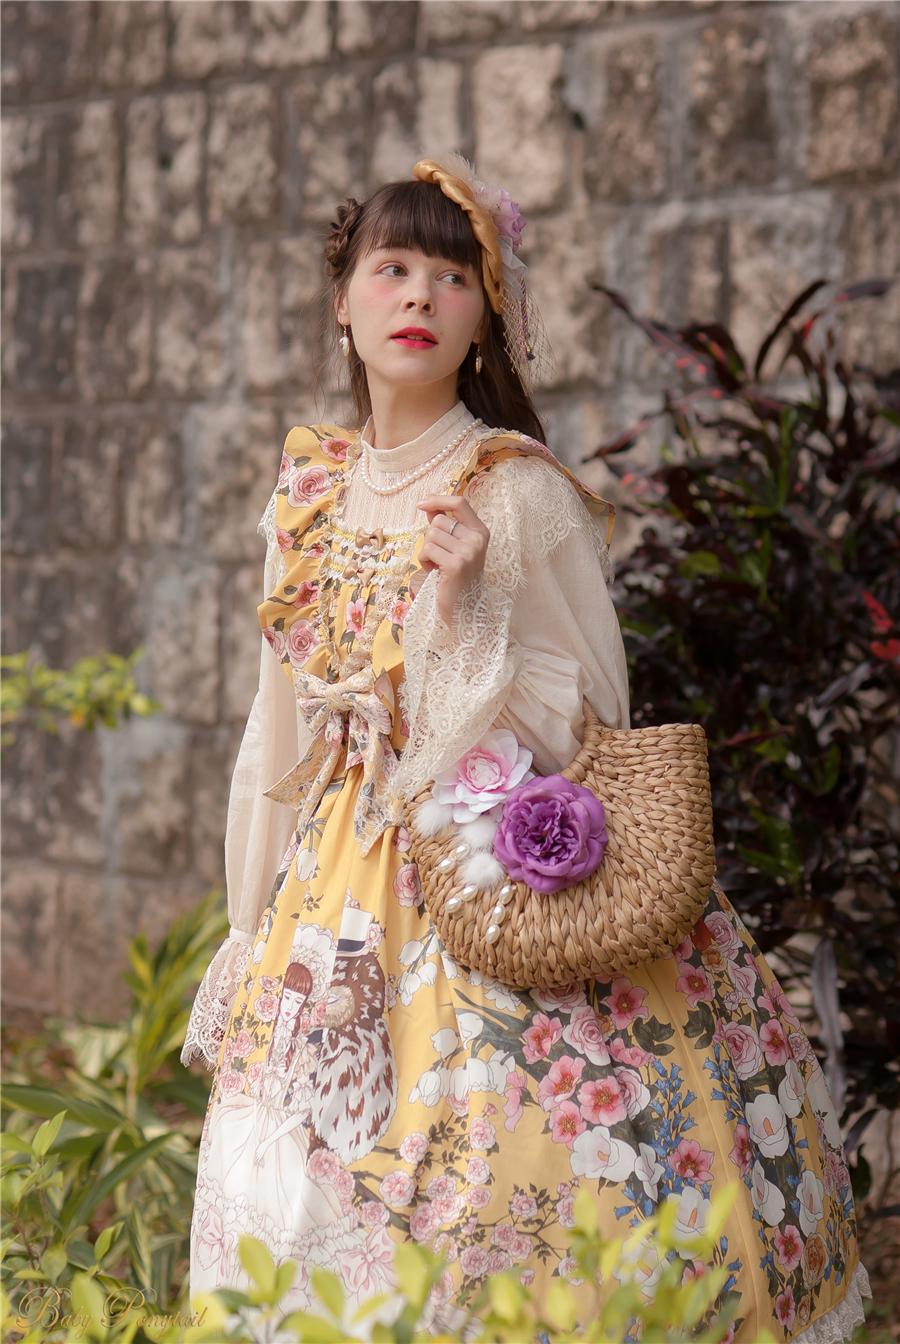 Baby Ponytail_Model Photo_Polly's Garden of Dreams_JSK Yellow_Claudia_9.jpg